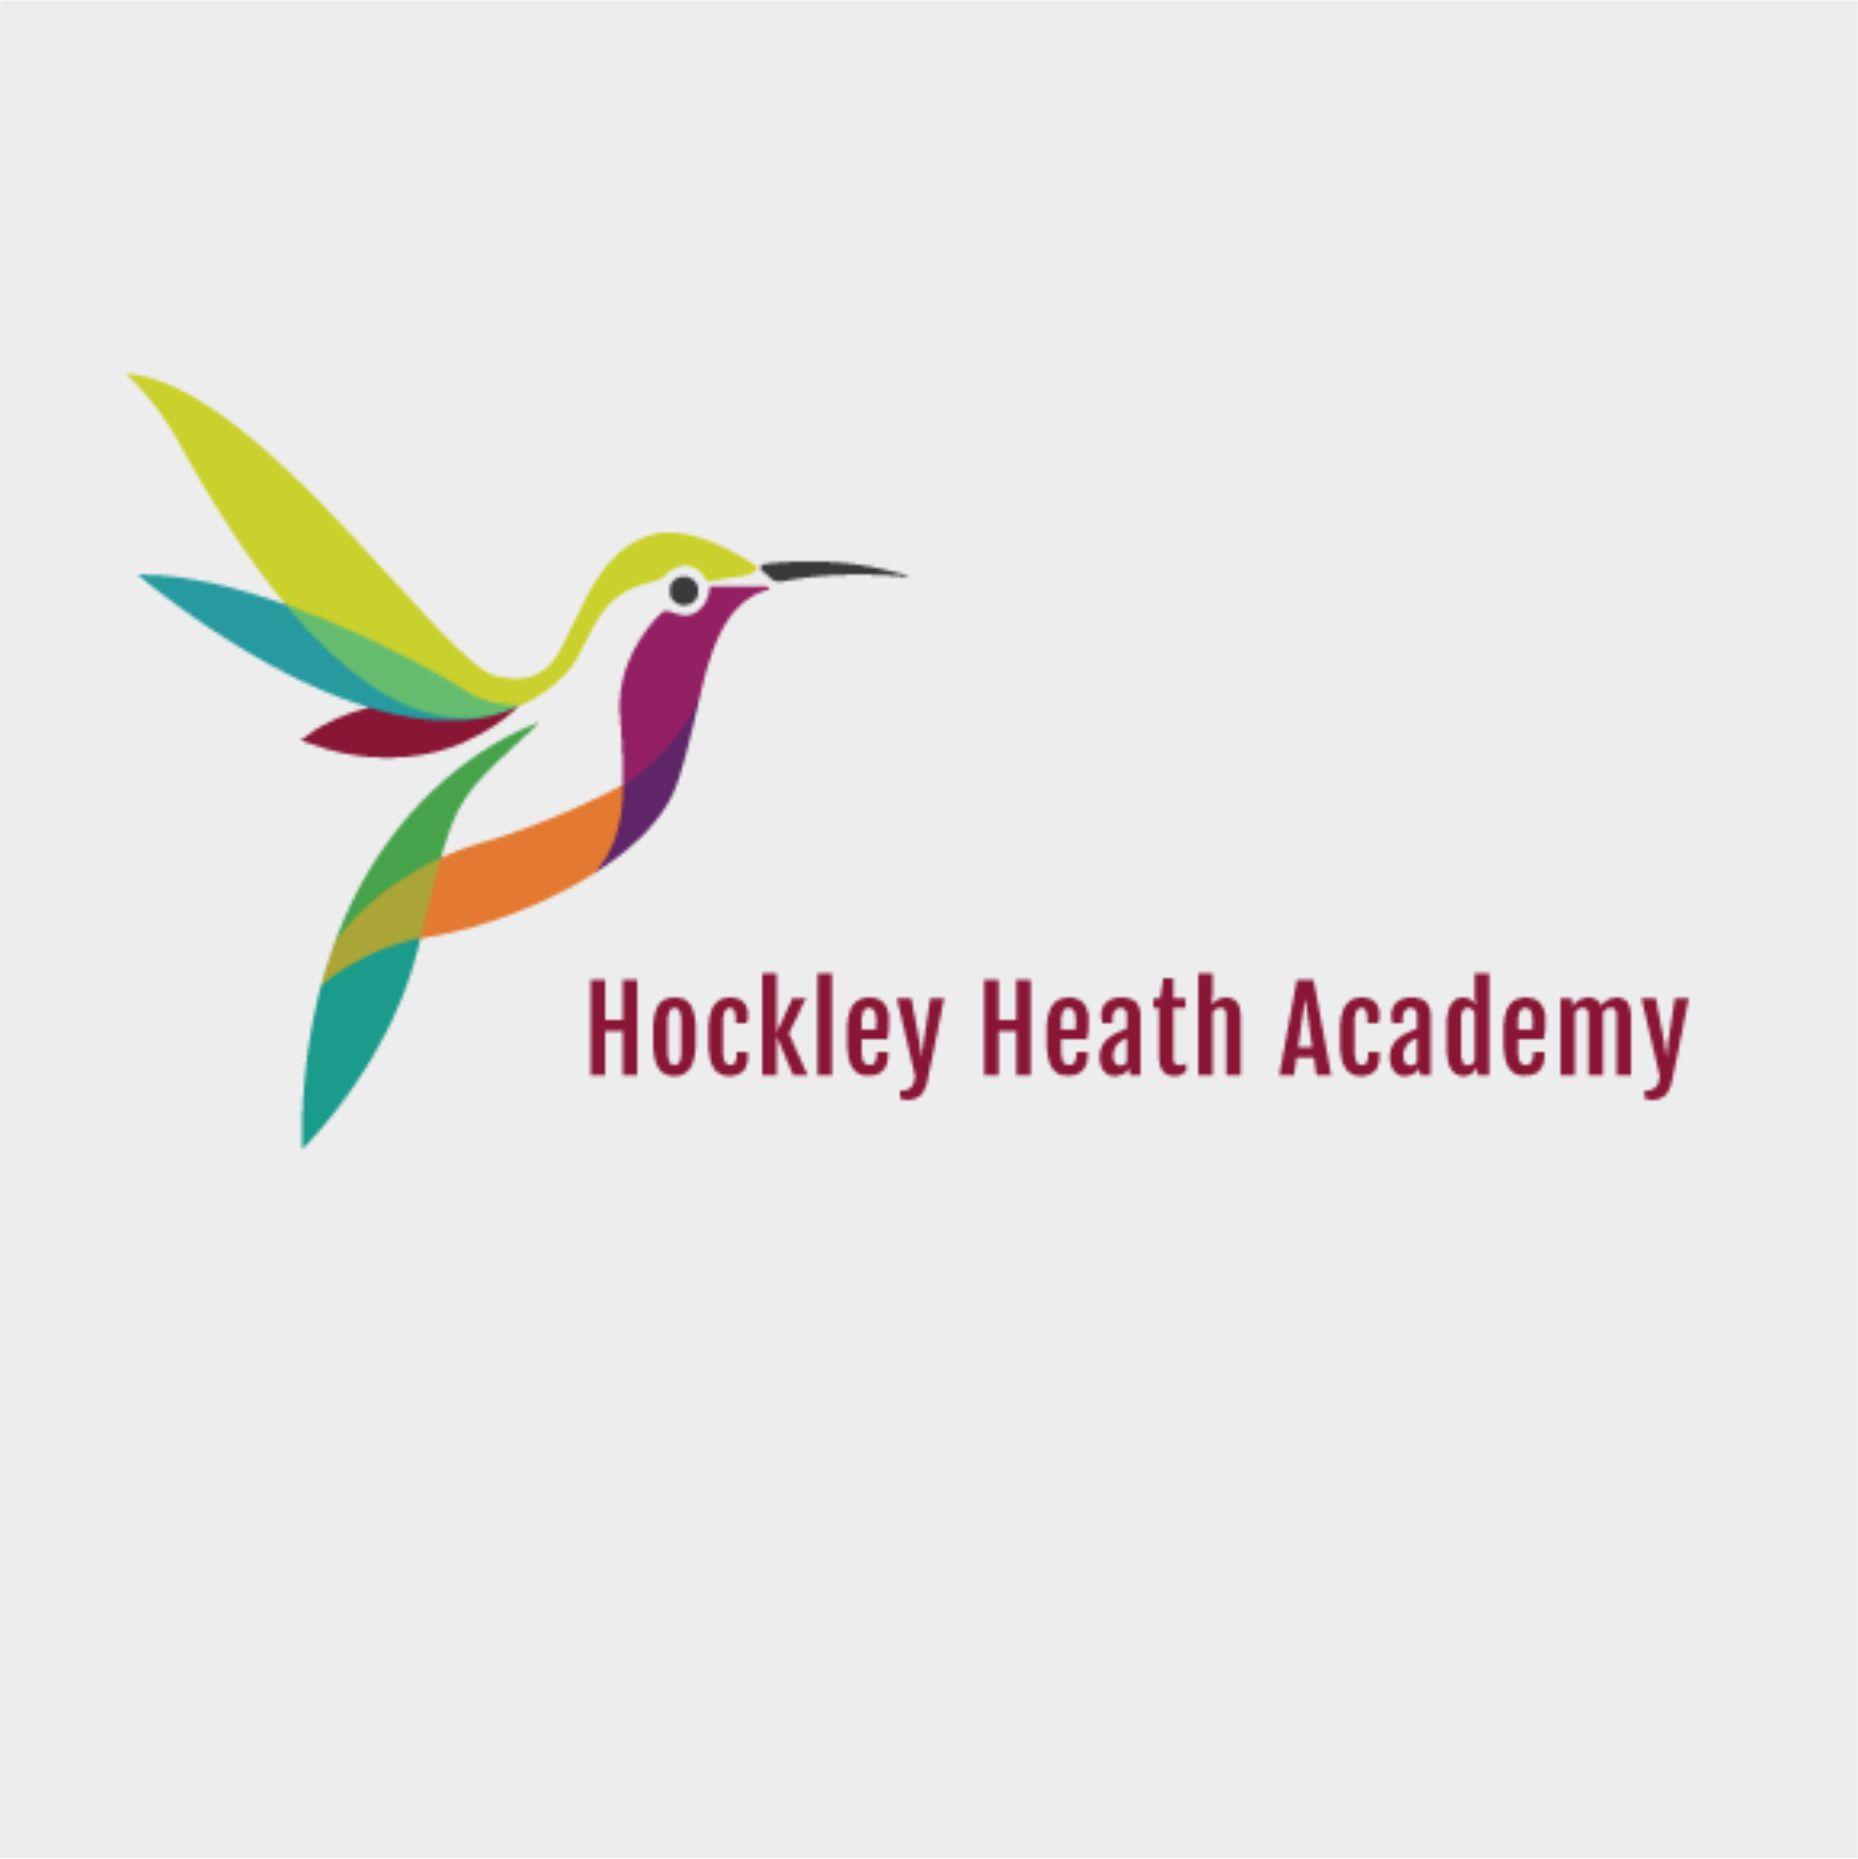 Hockley Heath Academy logo.jpg